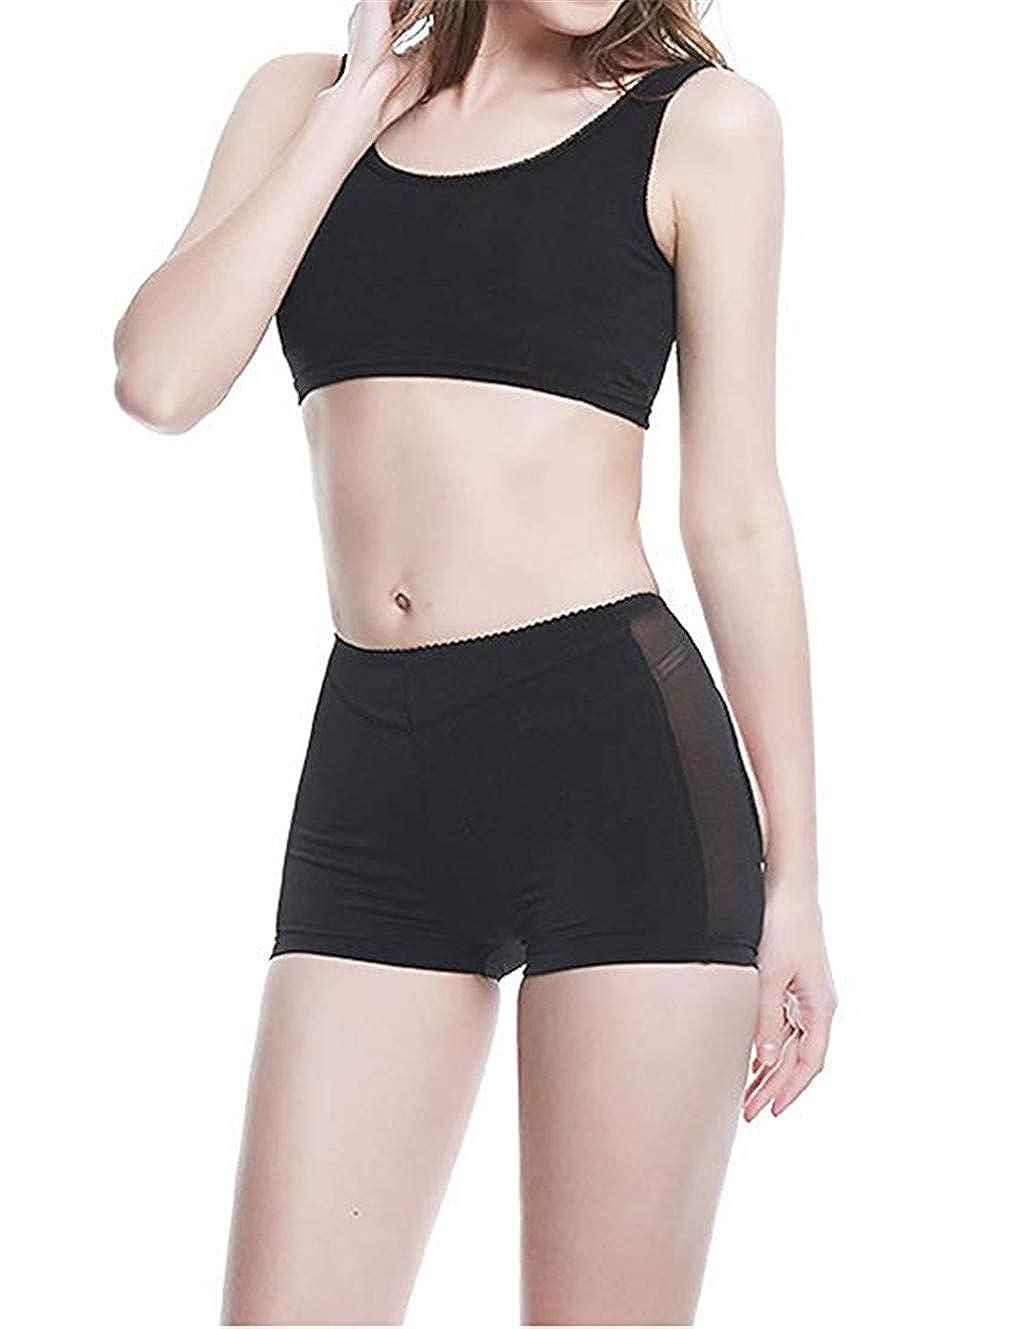 Women Seamless Butt Lifter Body Shaper Tummy Control Lift Girdle Panties Boyshorts Shapewear Underwear Boy Short Briefs